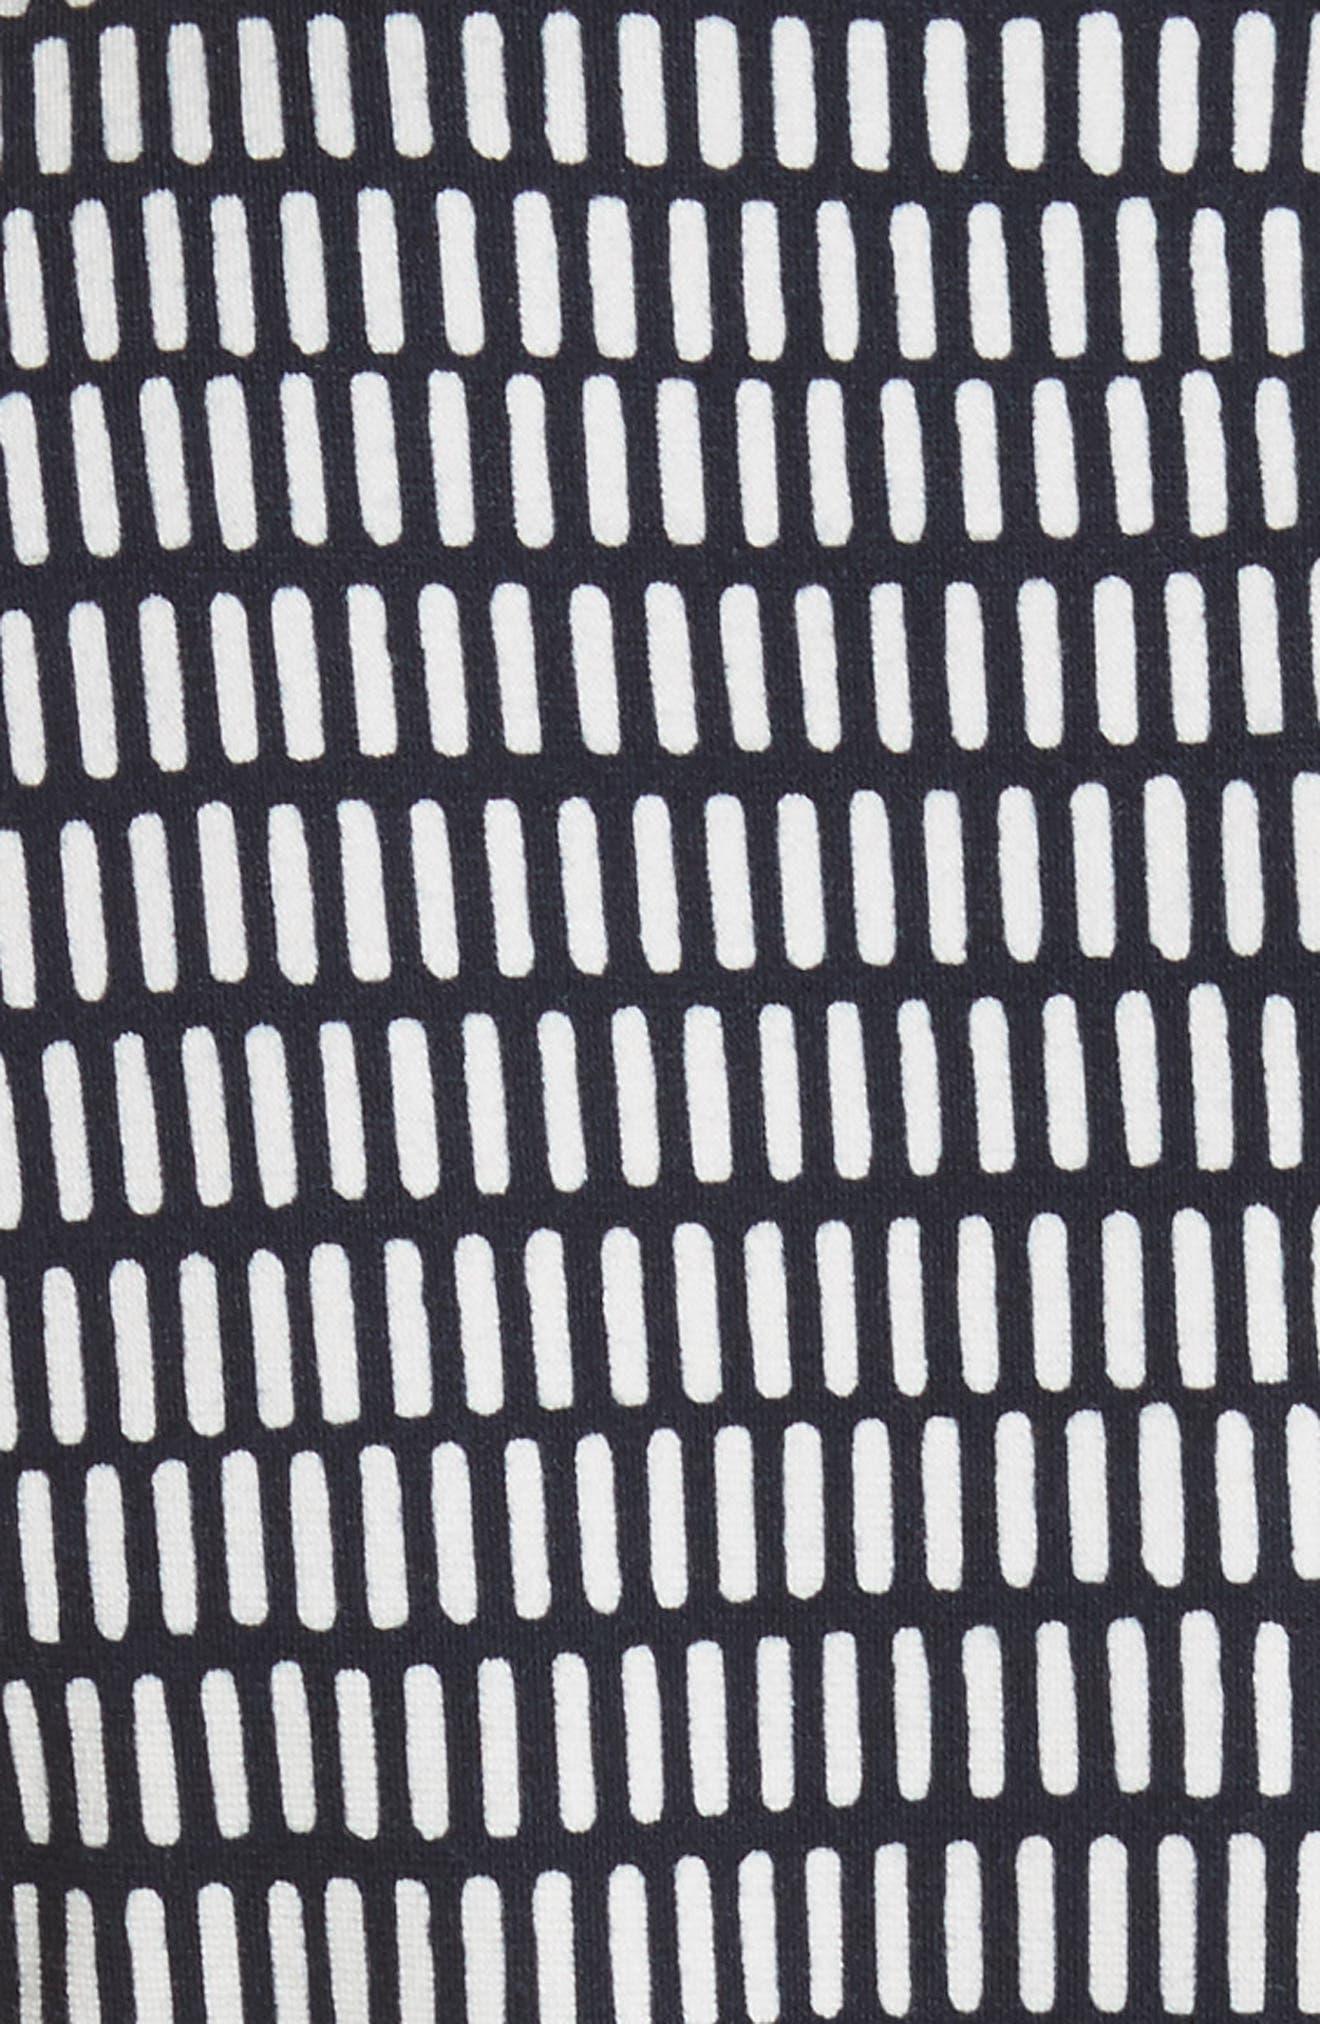 Felino Print Sheath Dress,                             Alternate thumbnail 5, color,                             404